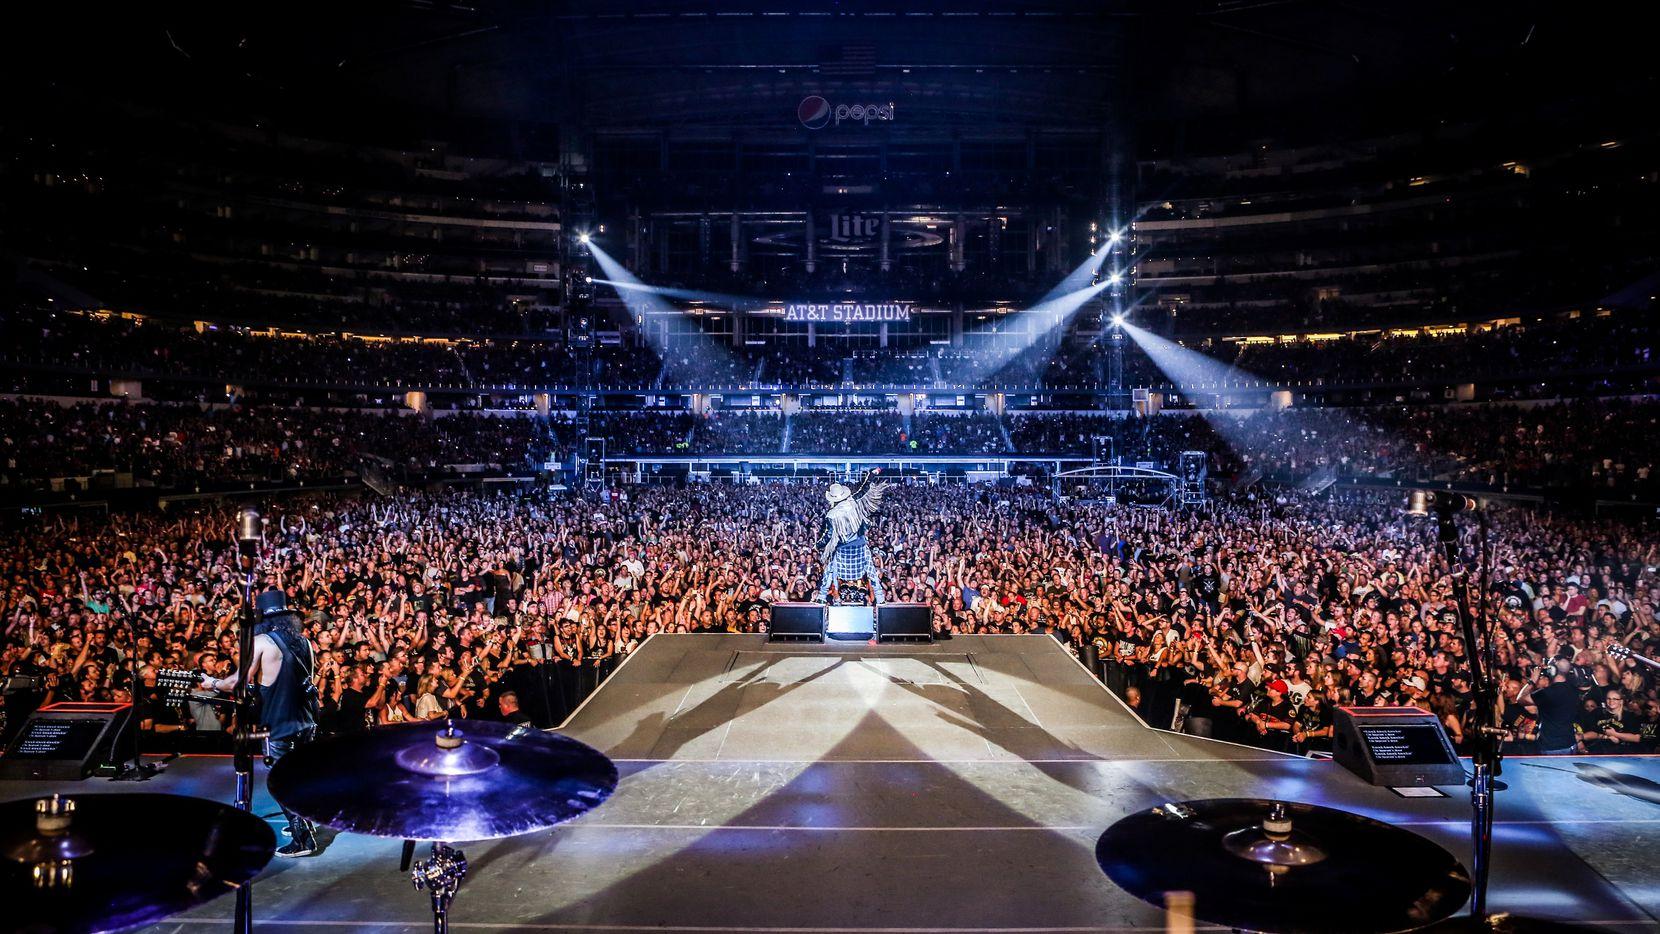 Guns 'N Roses at AT&T Stadium on Aug. 3, 2016